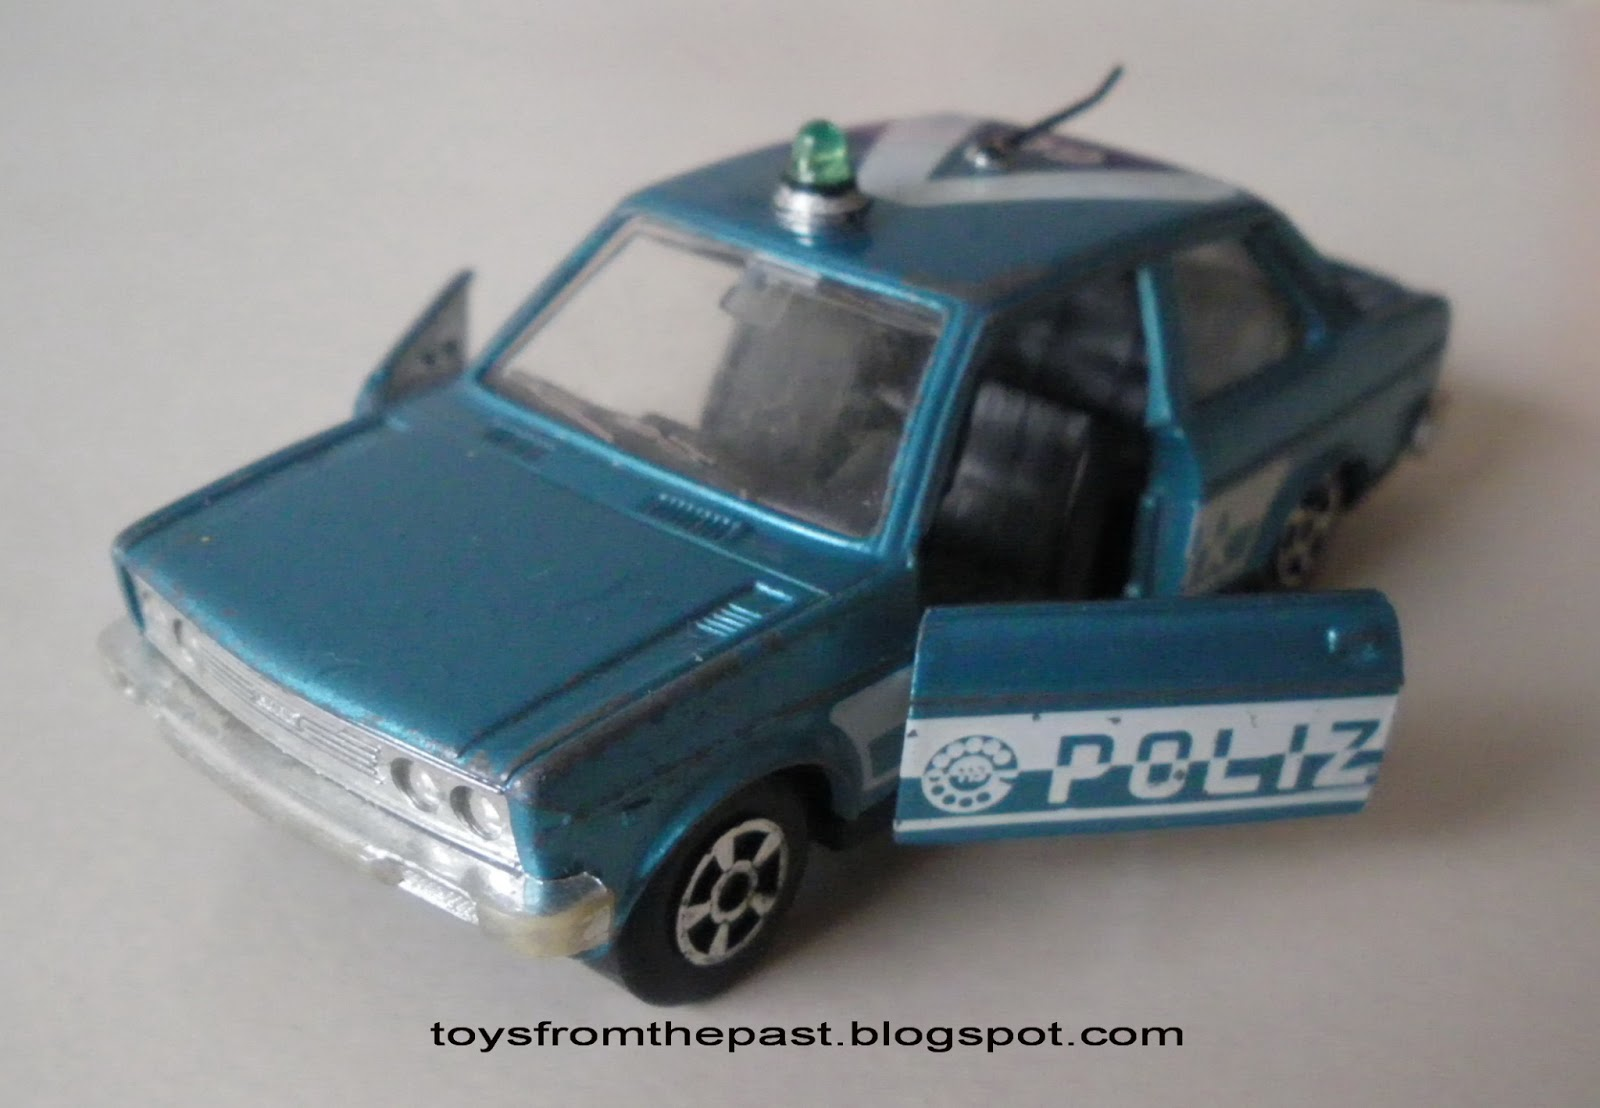 EL76 Fiat 131 Mirafiori polizia (cc-by-nc-nd 3.0 toysfromthepast)